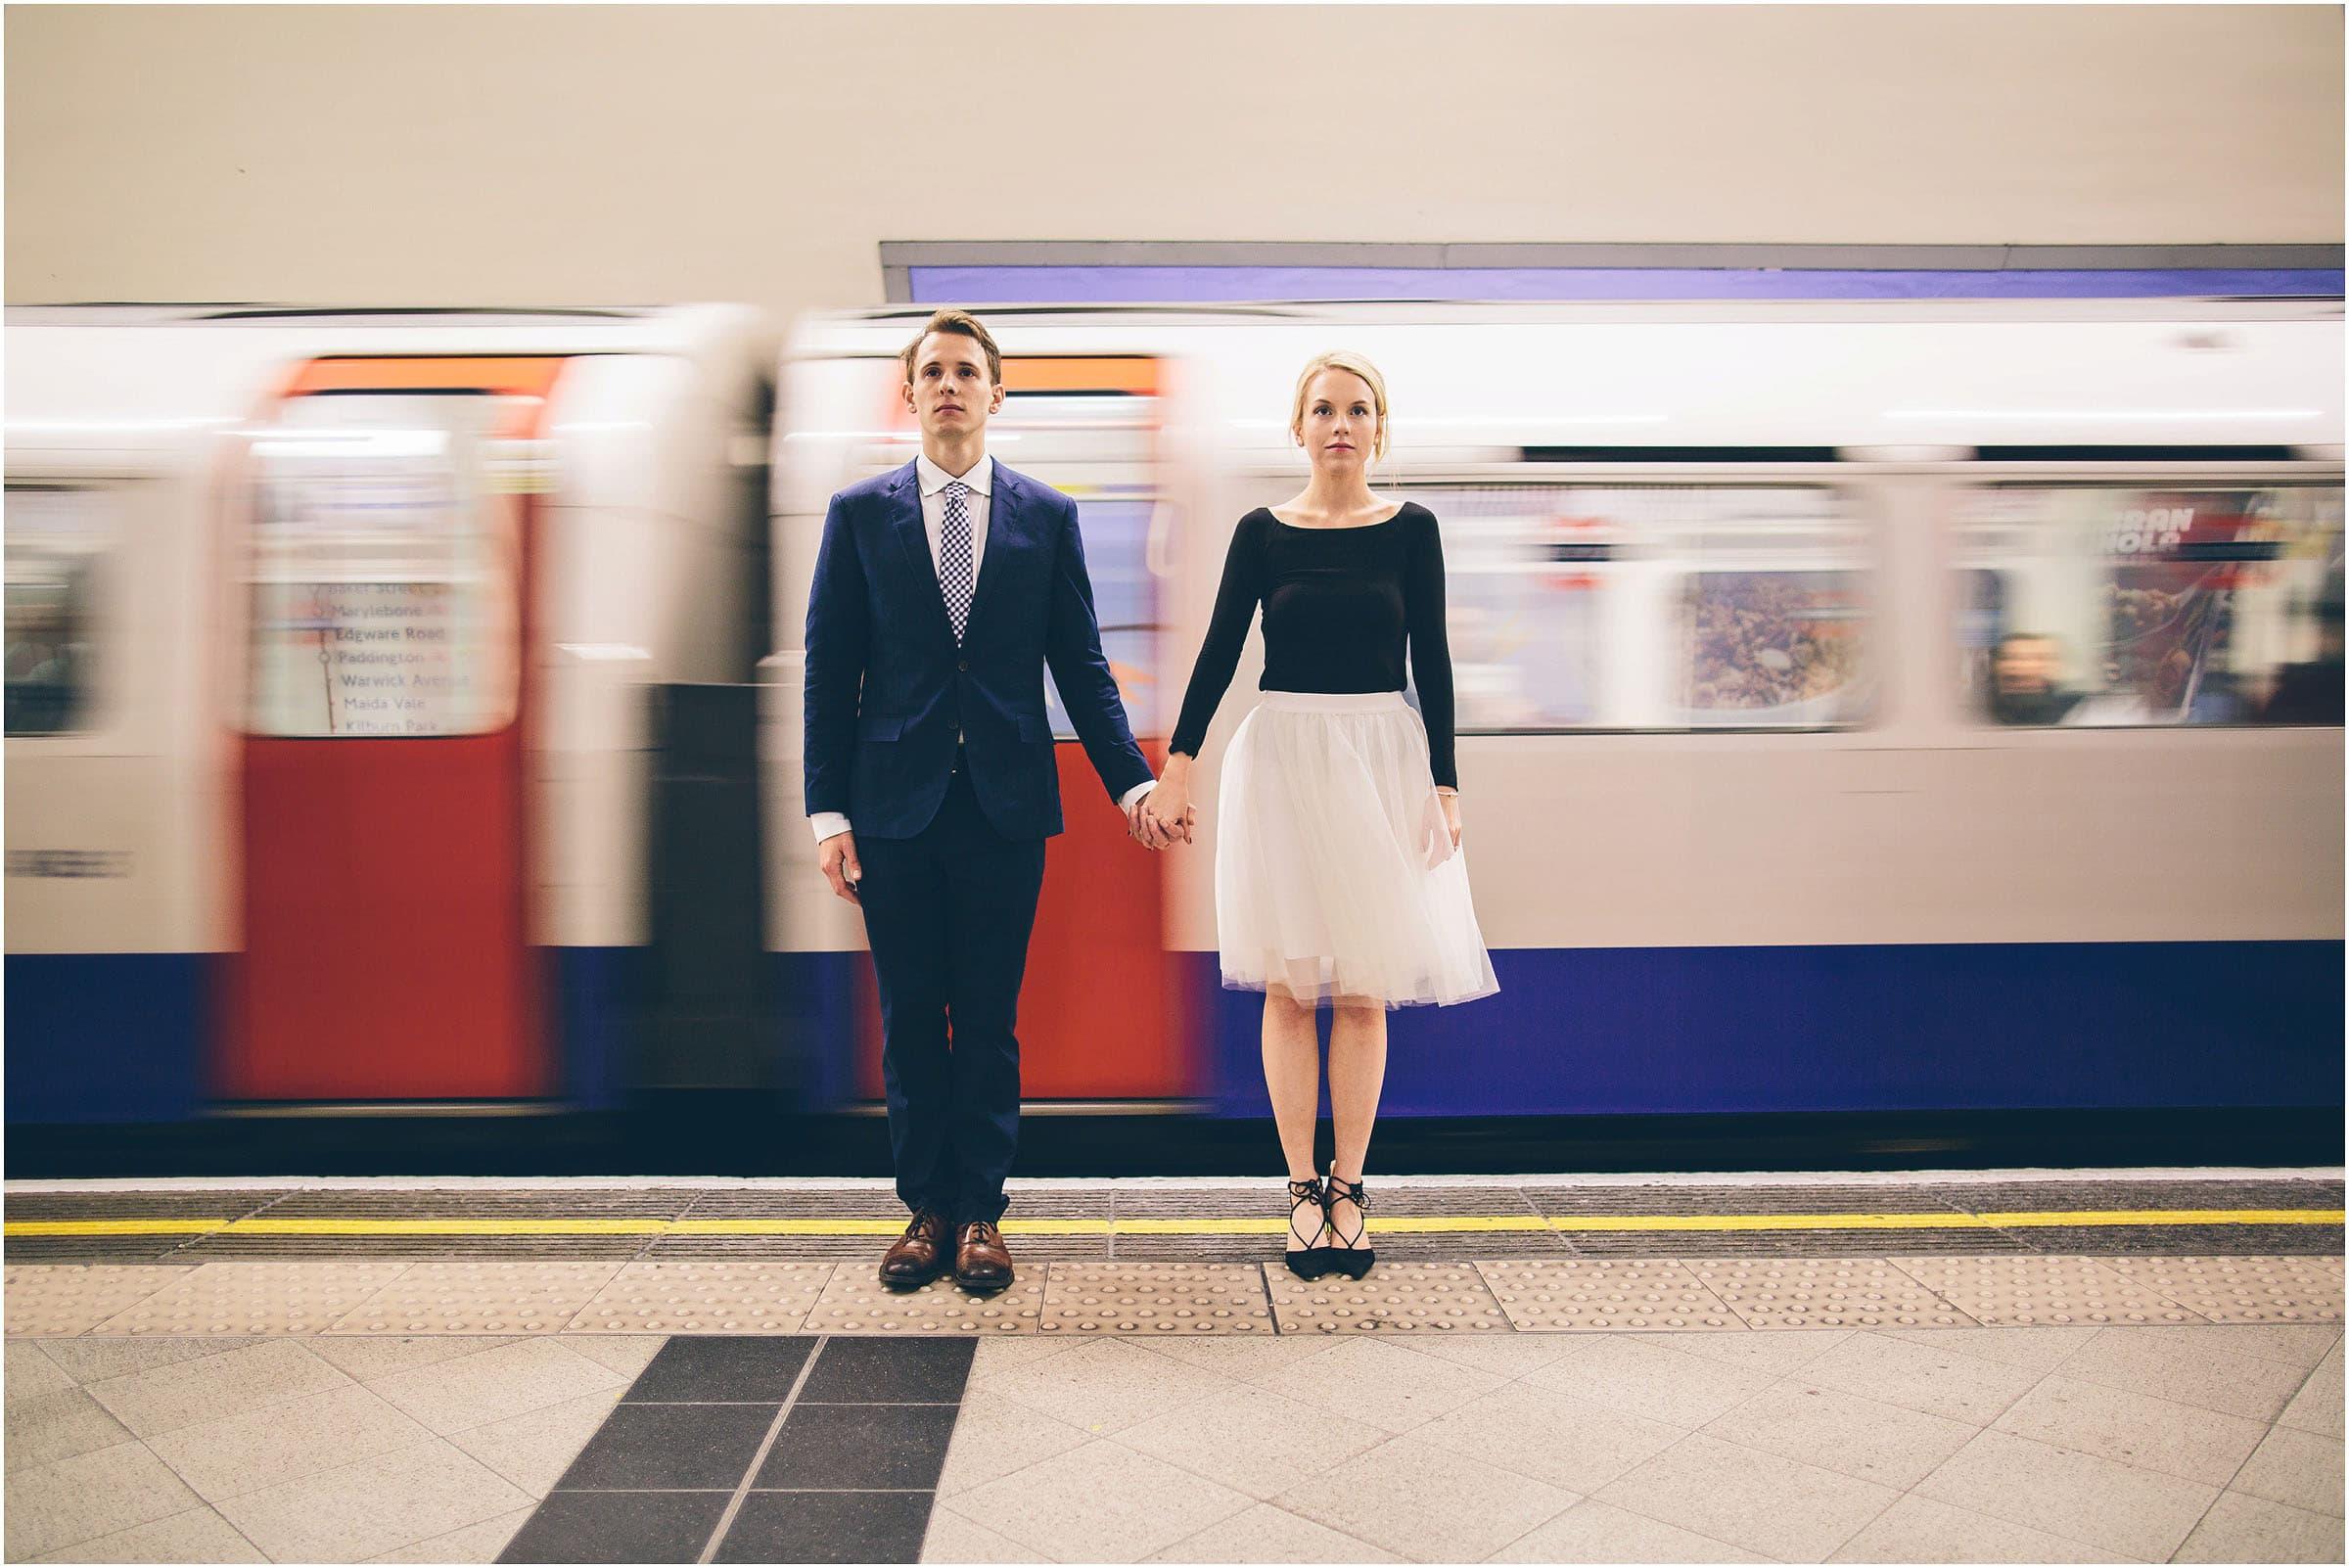 London_Engagement_Photography_0003